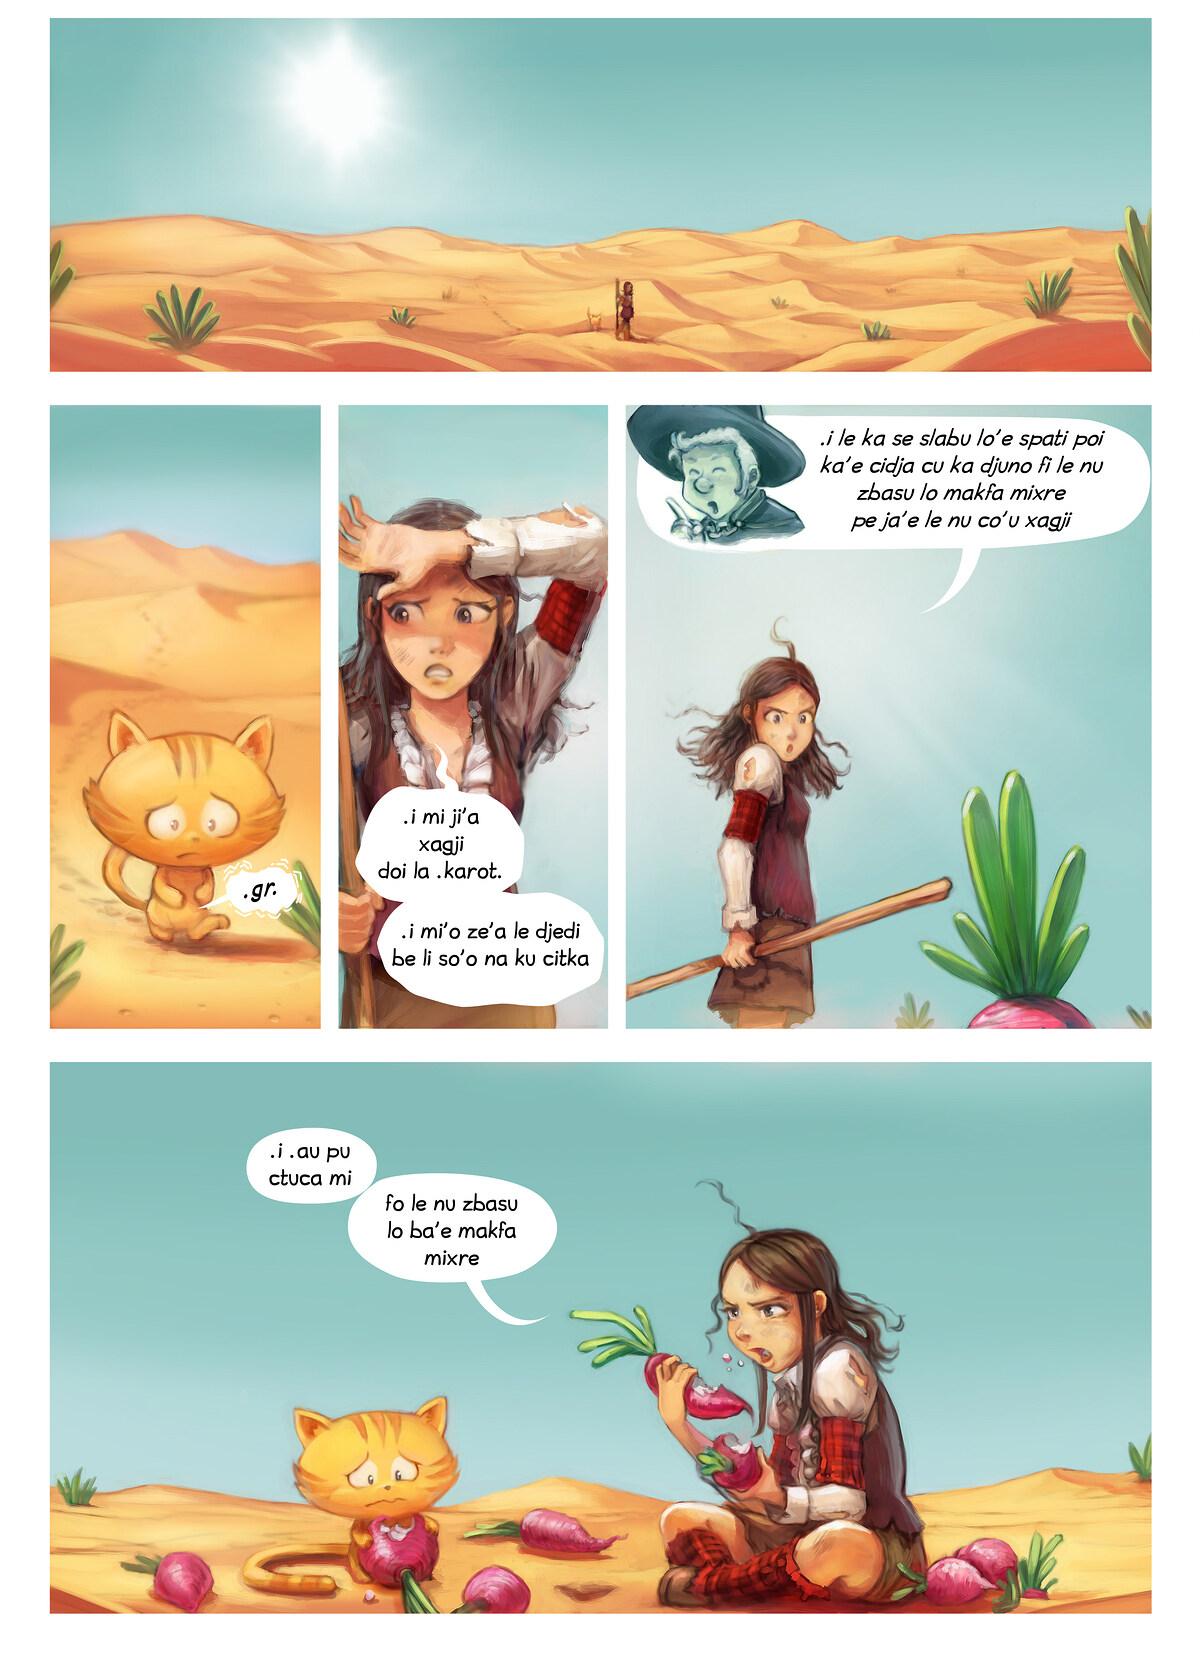 A webcomic page of Pepper&Carrot, pagbu 17 [jb], papri 5